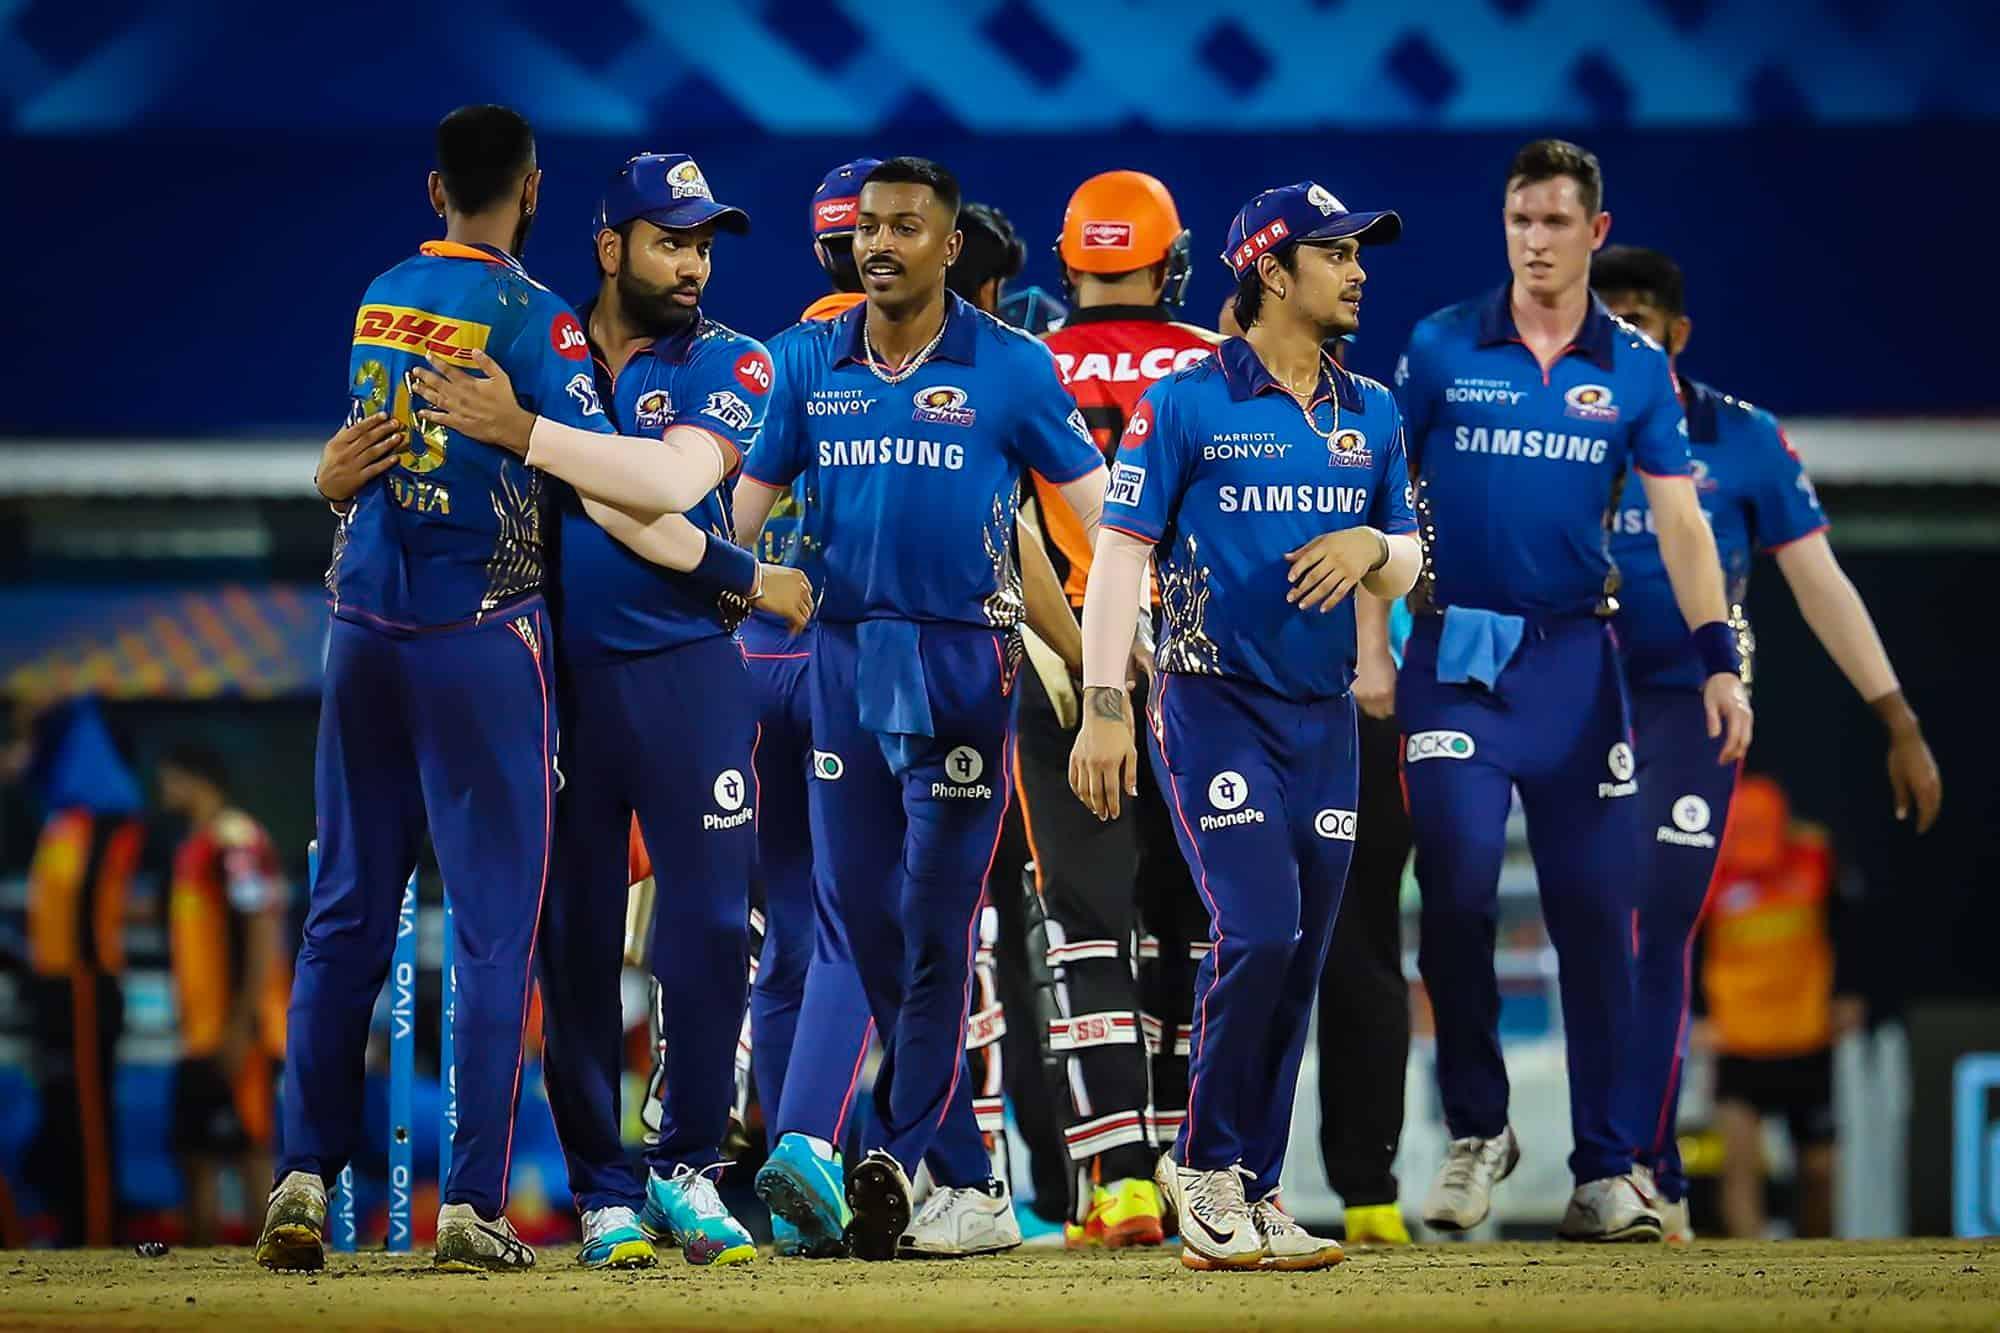 MI vs SRH: Four Records Broken As Mumbai Indians Survives Another Low Scoring Game - Match 10, IPL 2021